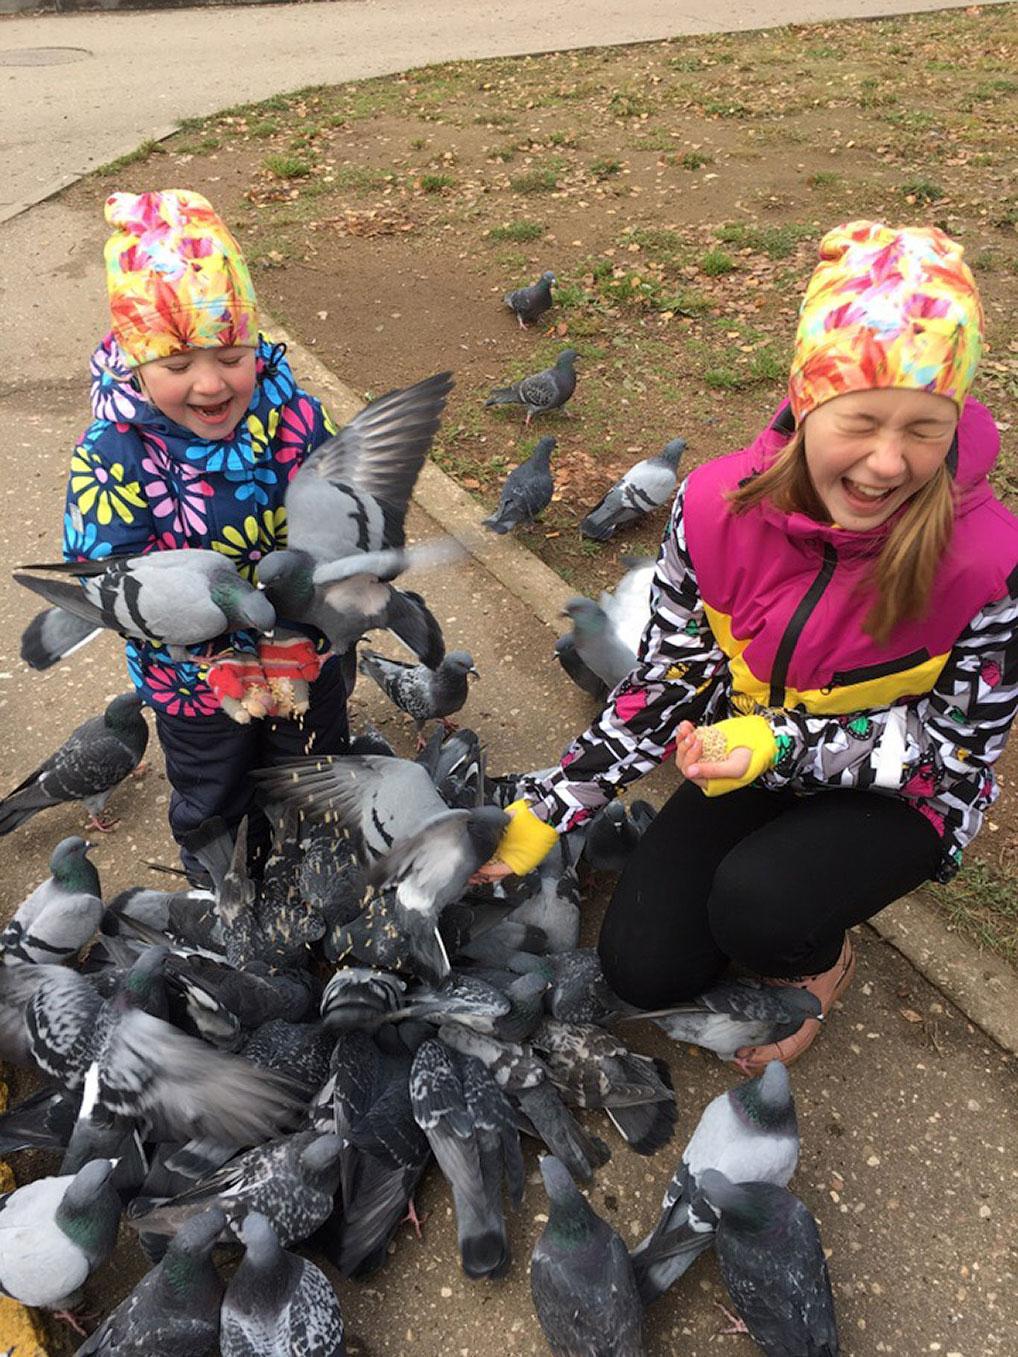 №5 Аделина и Кристина - с любовью к птицам! Автор: Алена Косулина